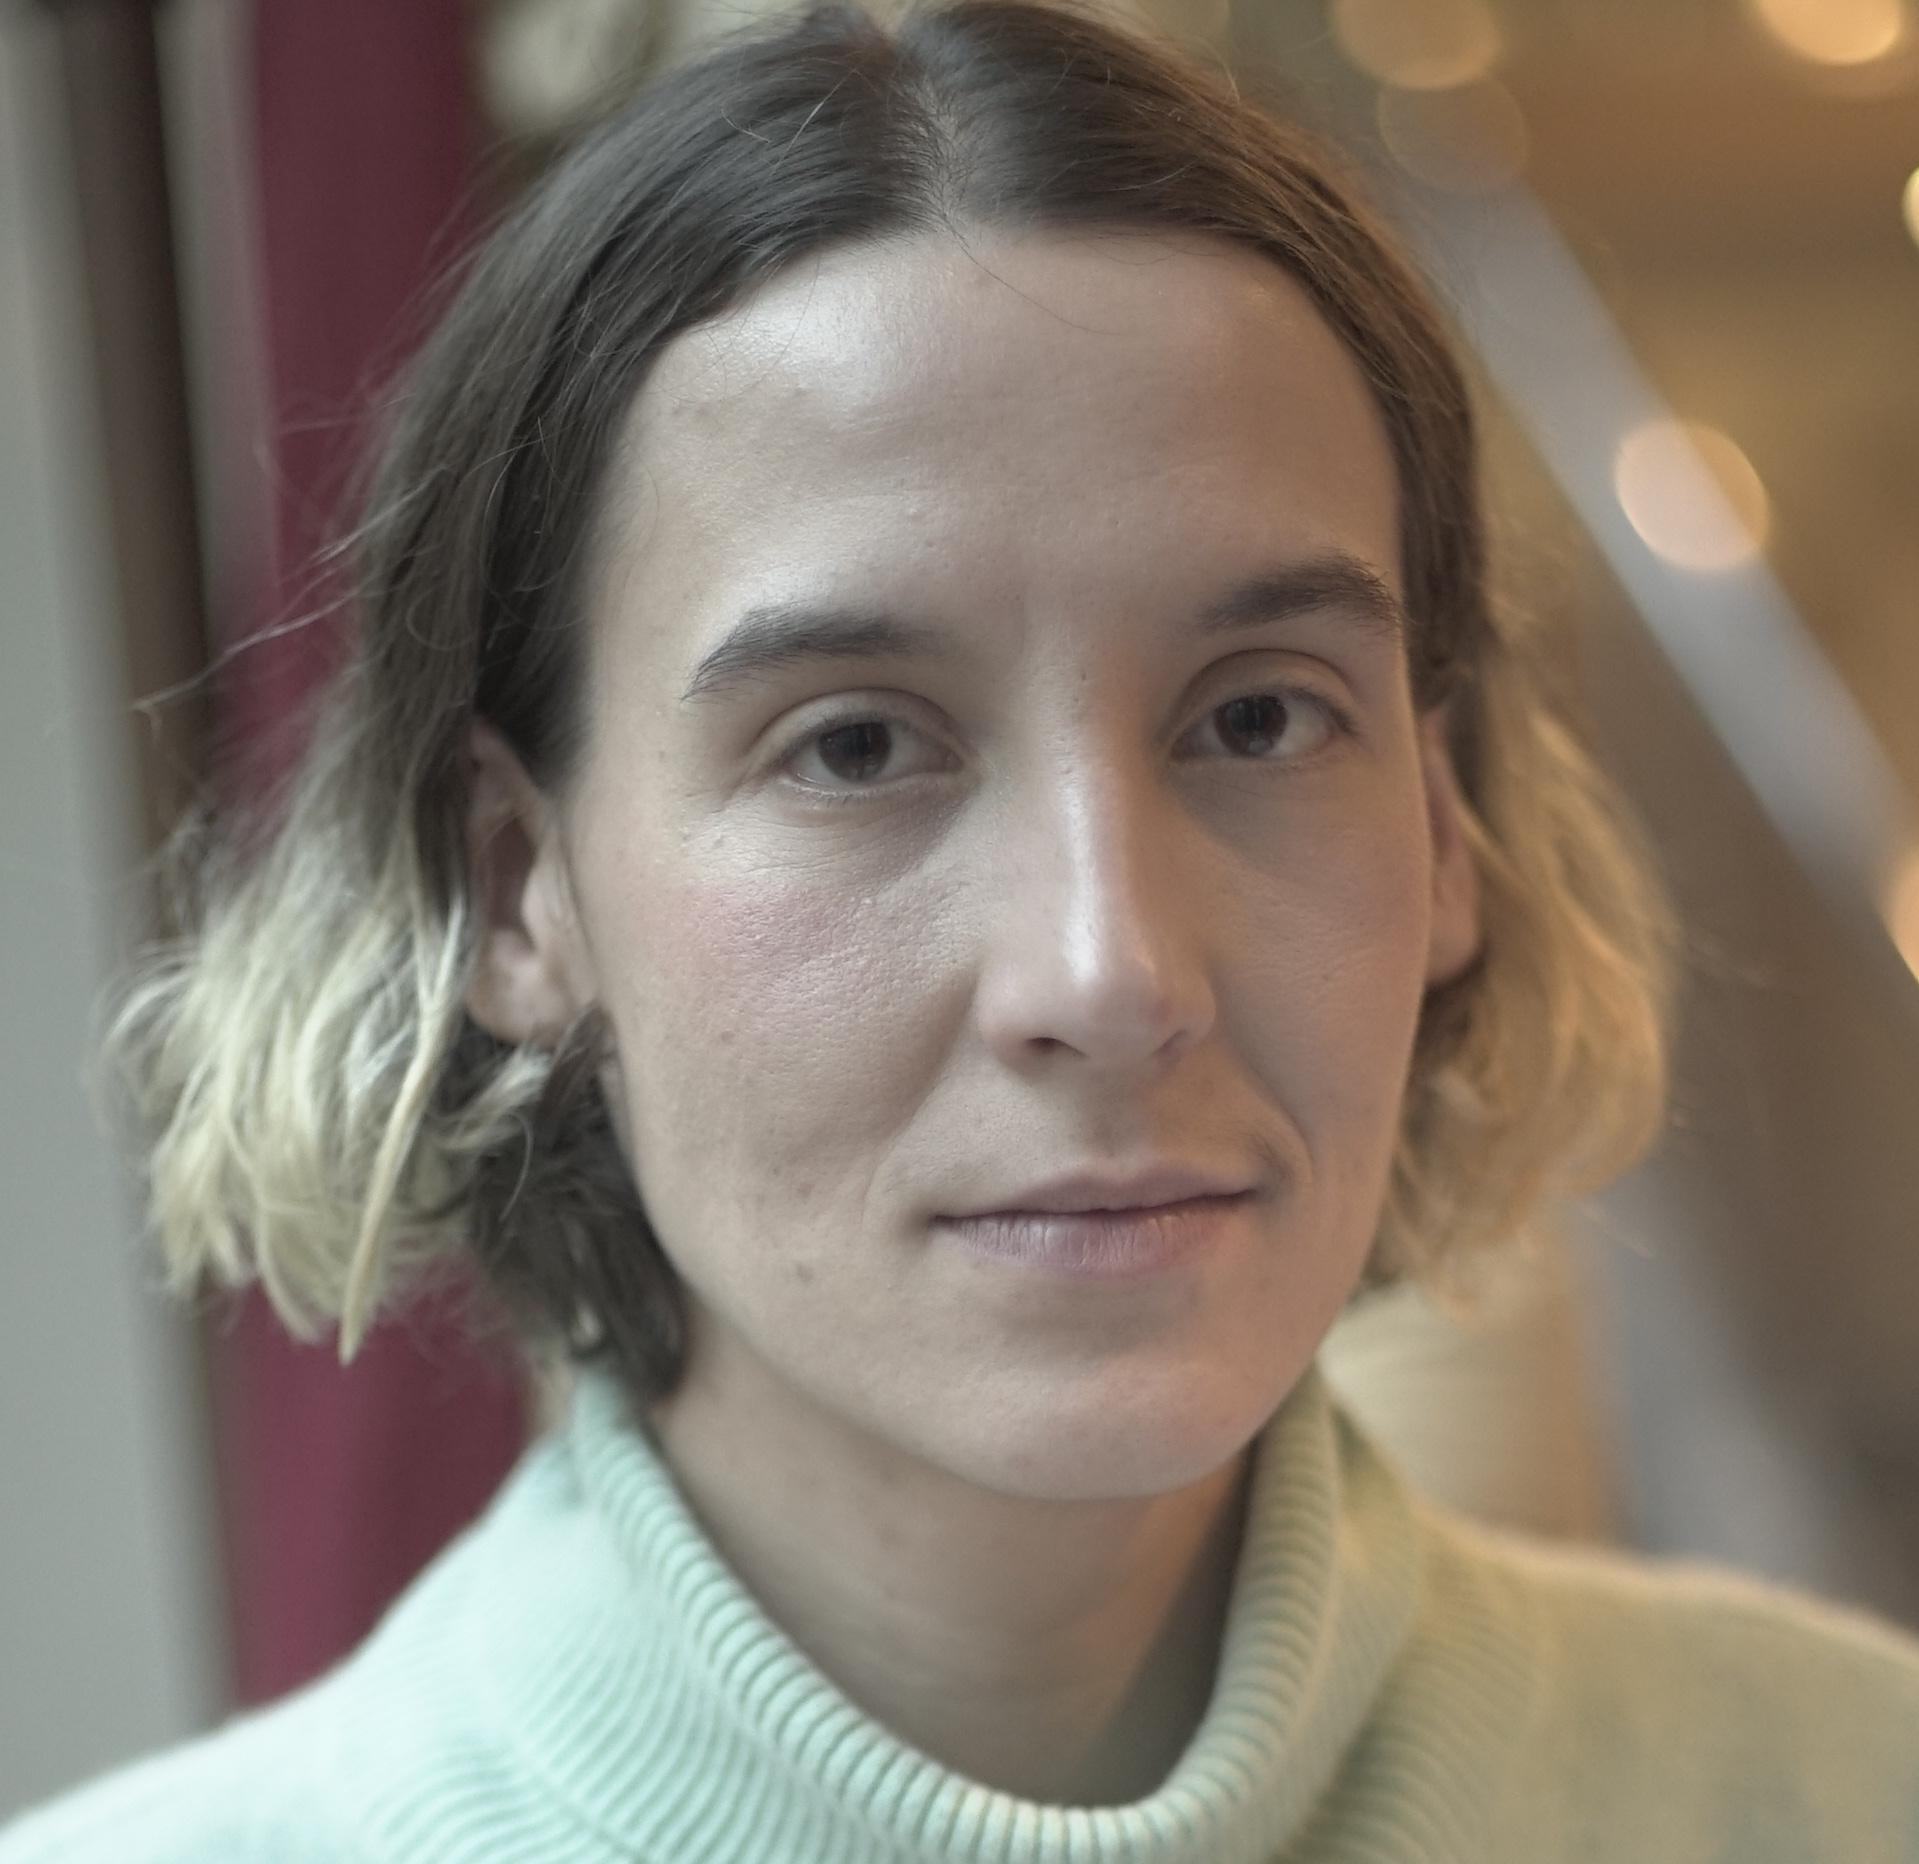 Milena Michalek